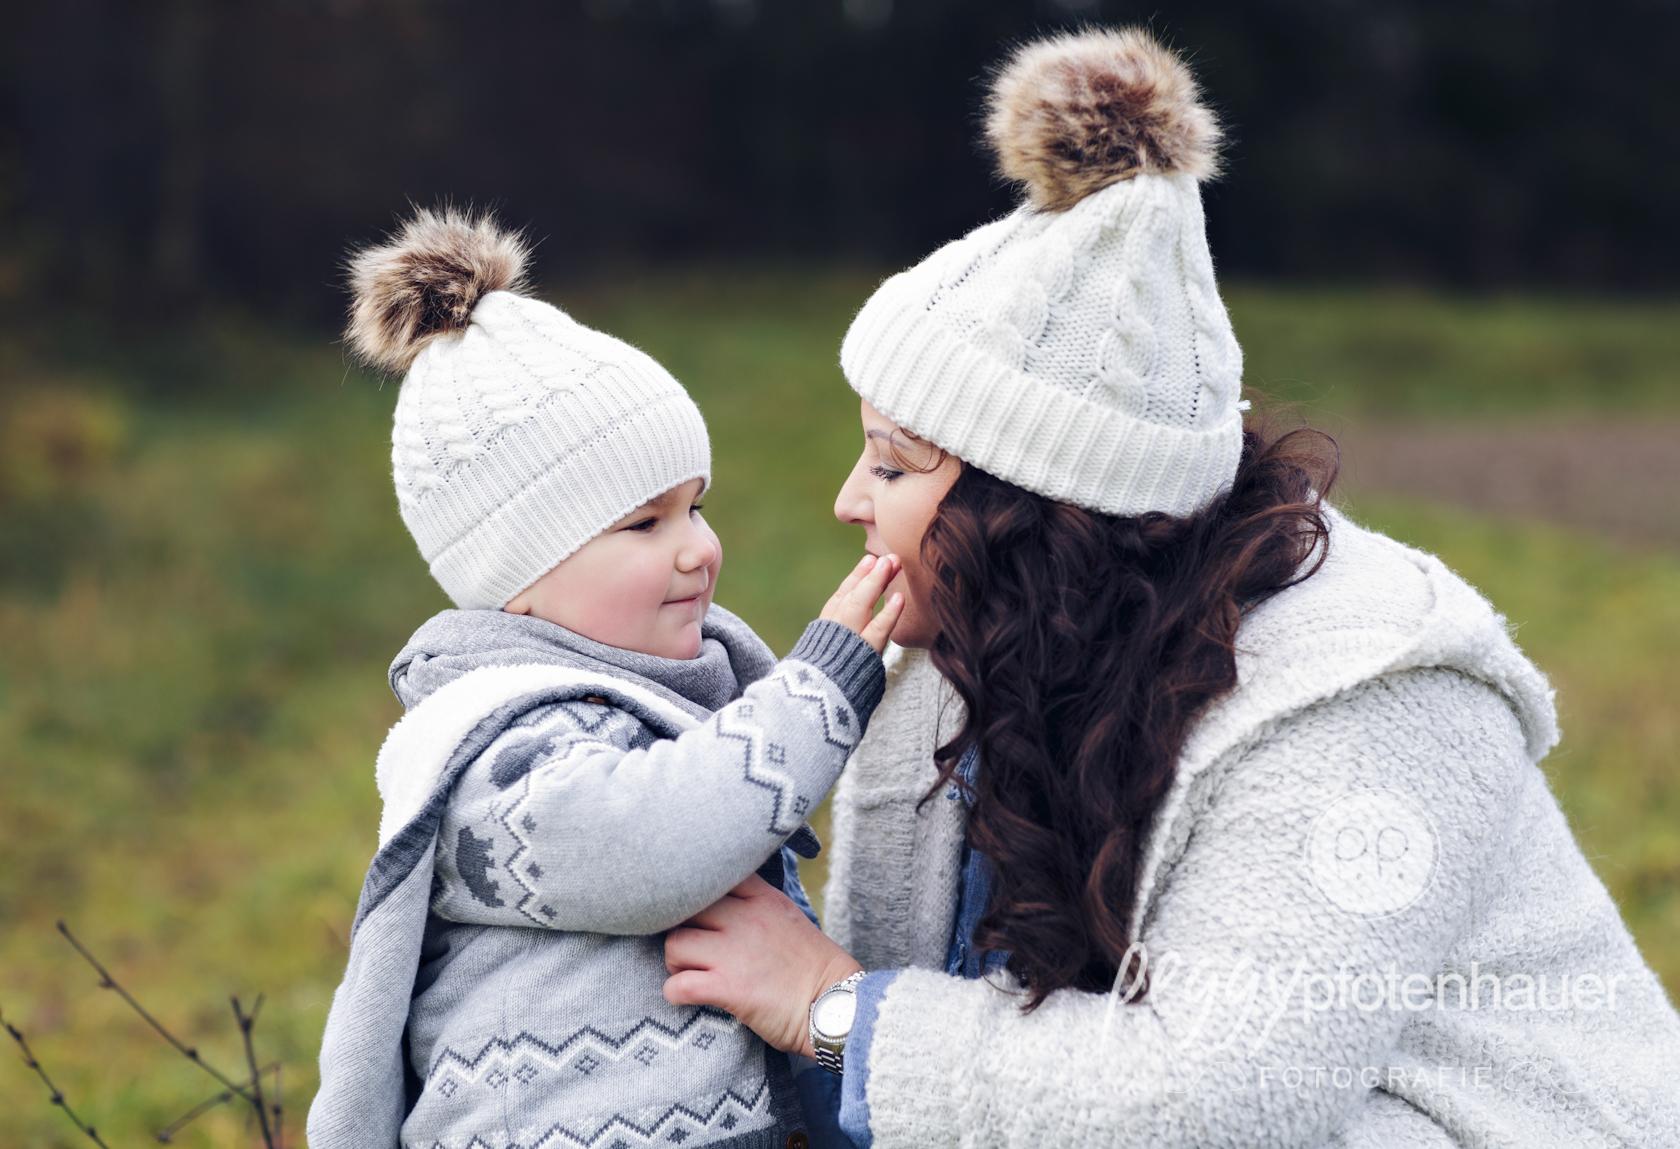 Kinderfotoshooting Bayern Peggy Pfotenhauer Fotografie